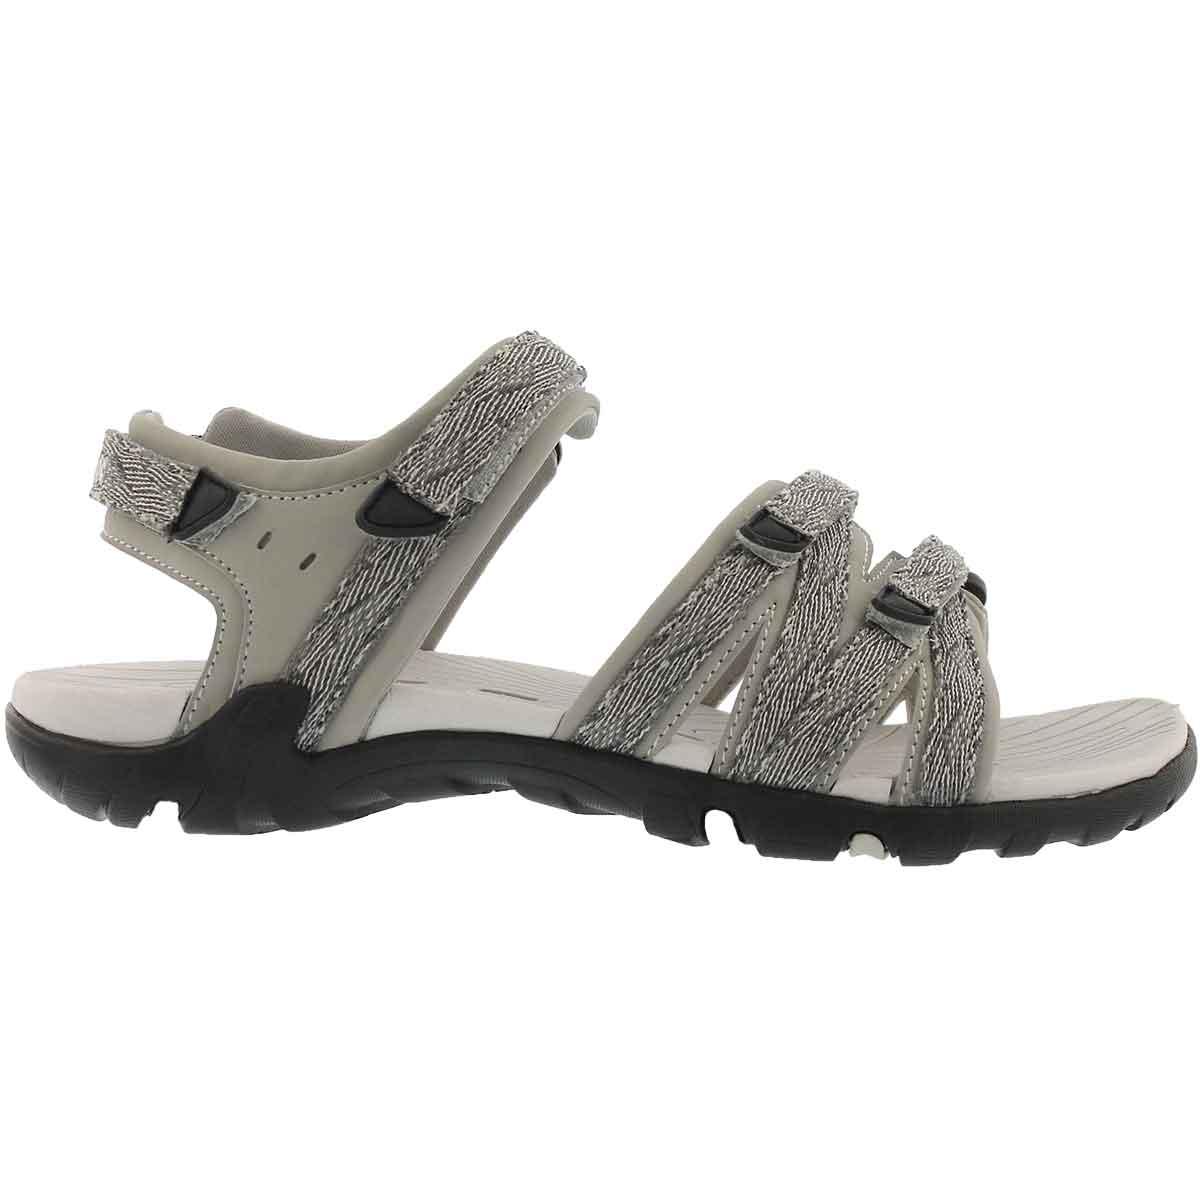 Lds Khaleesi grey sport sandal